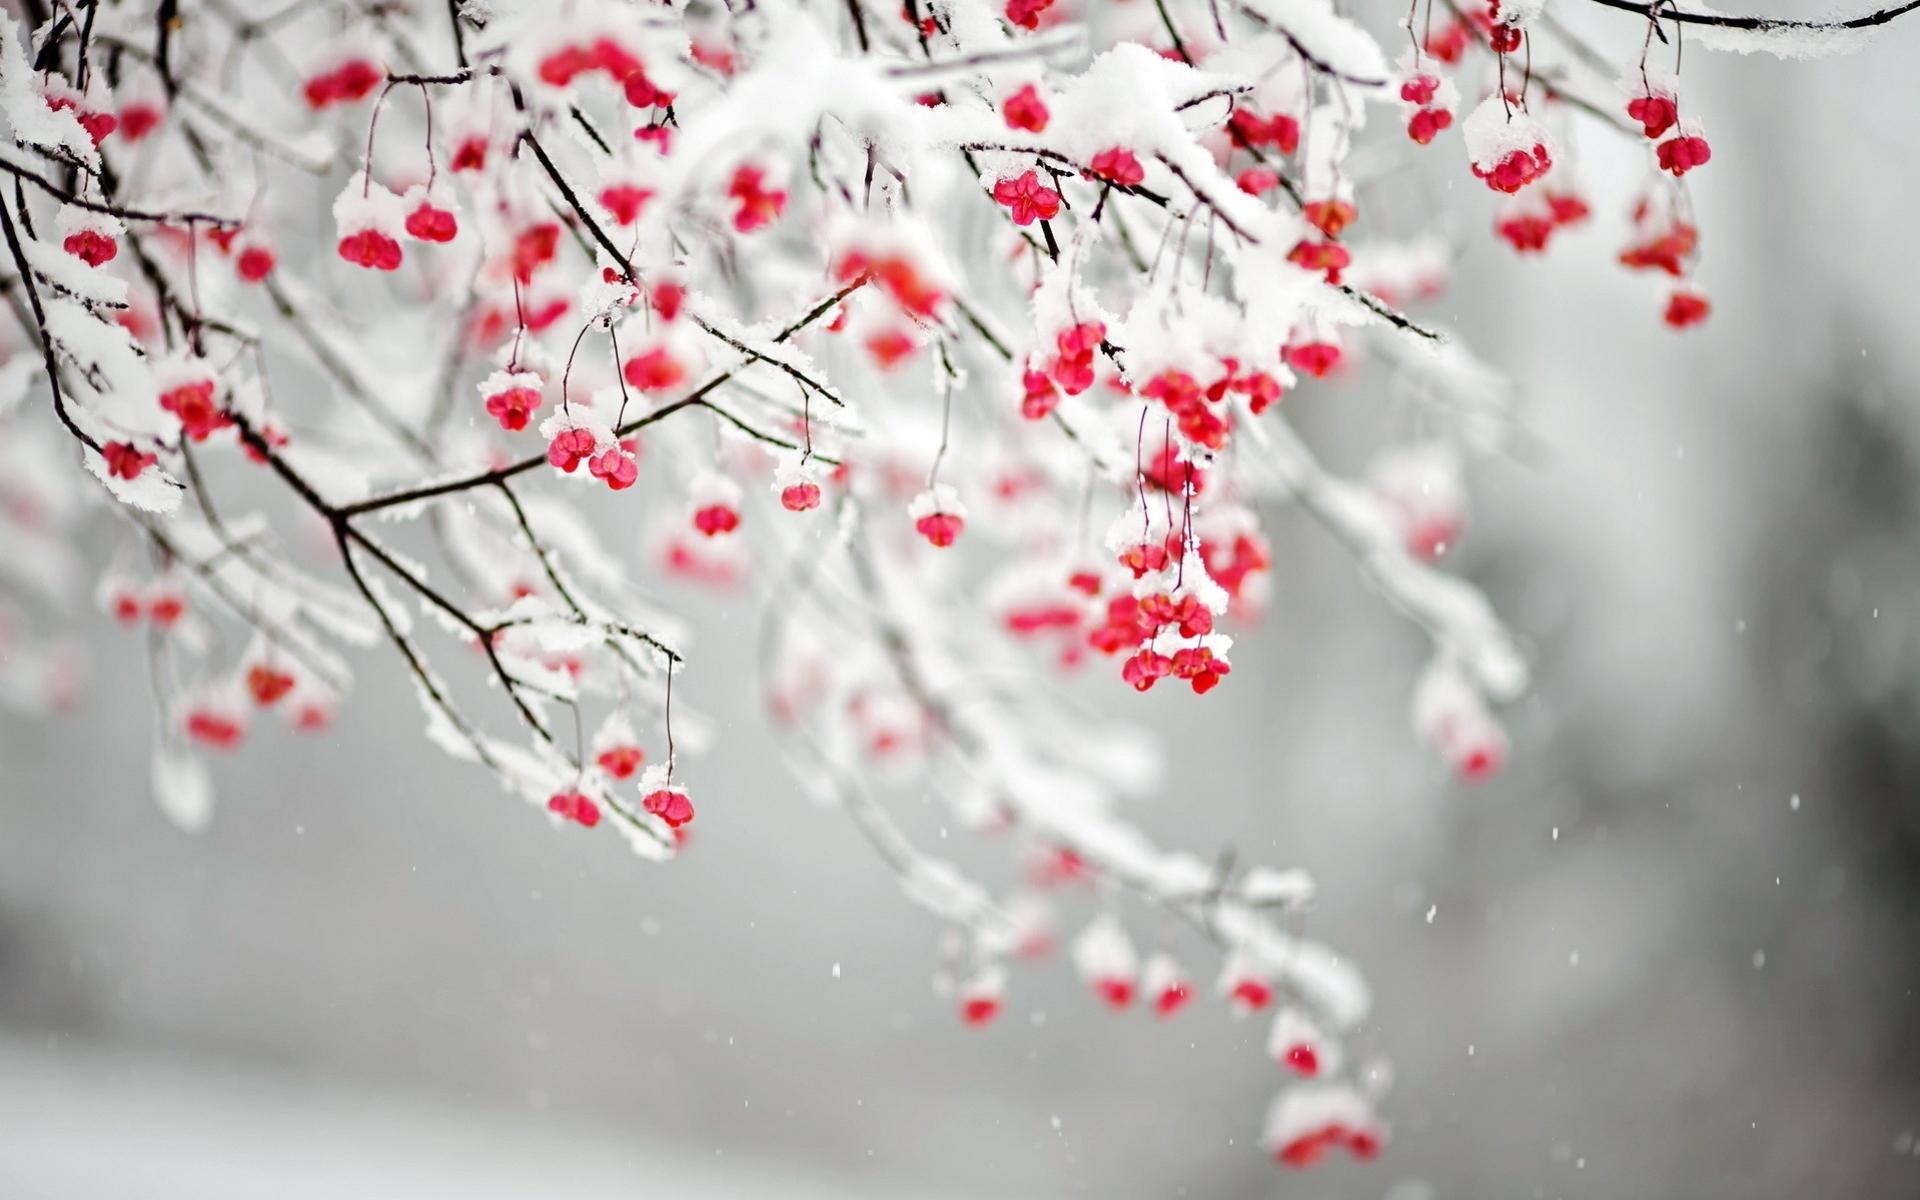 88 Winter Flowers Wallpapers On Wallpapersafari